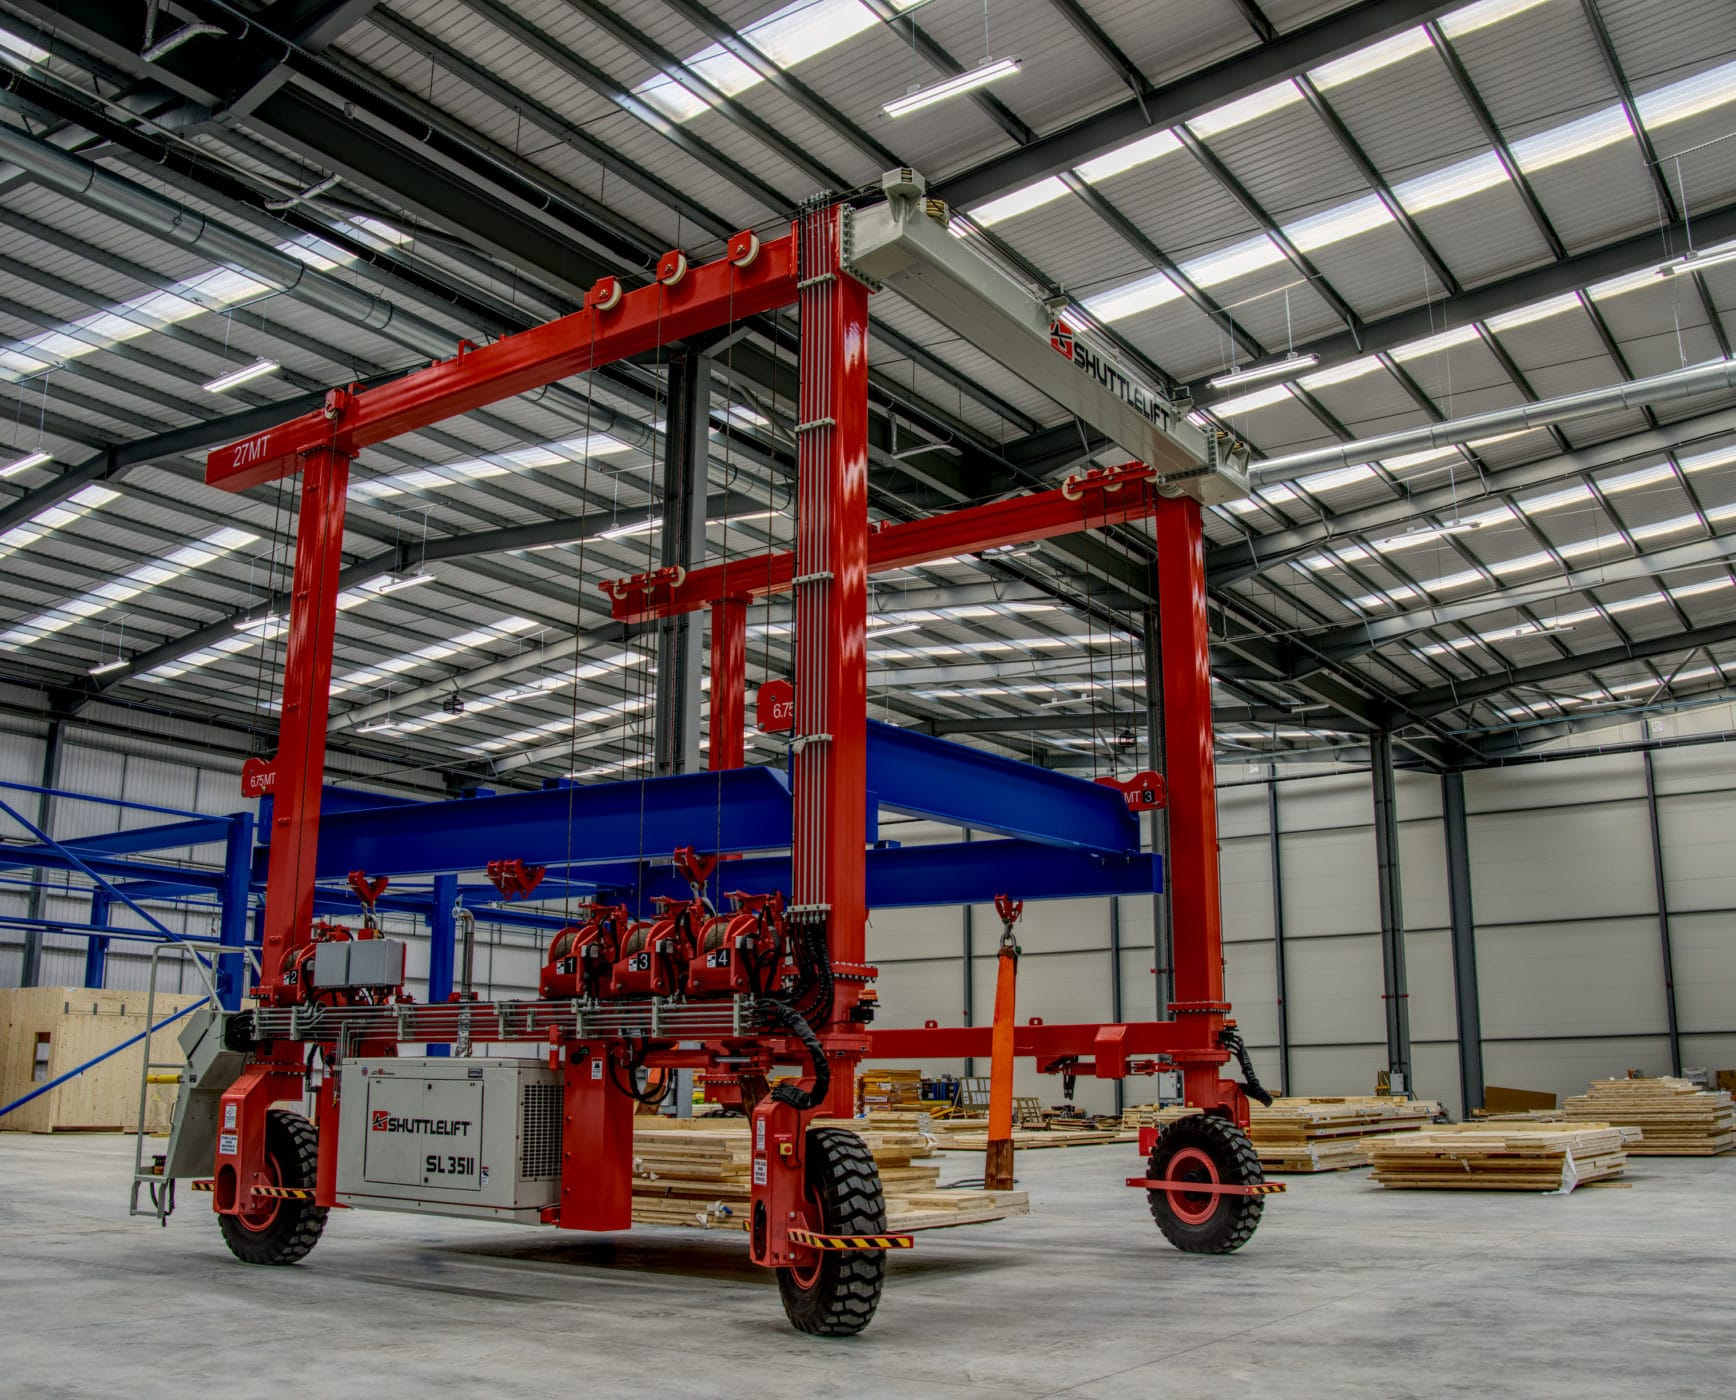 Shuttlelift SL35 gantry crane container handling application in the UK